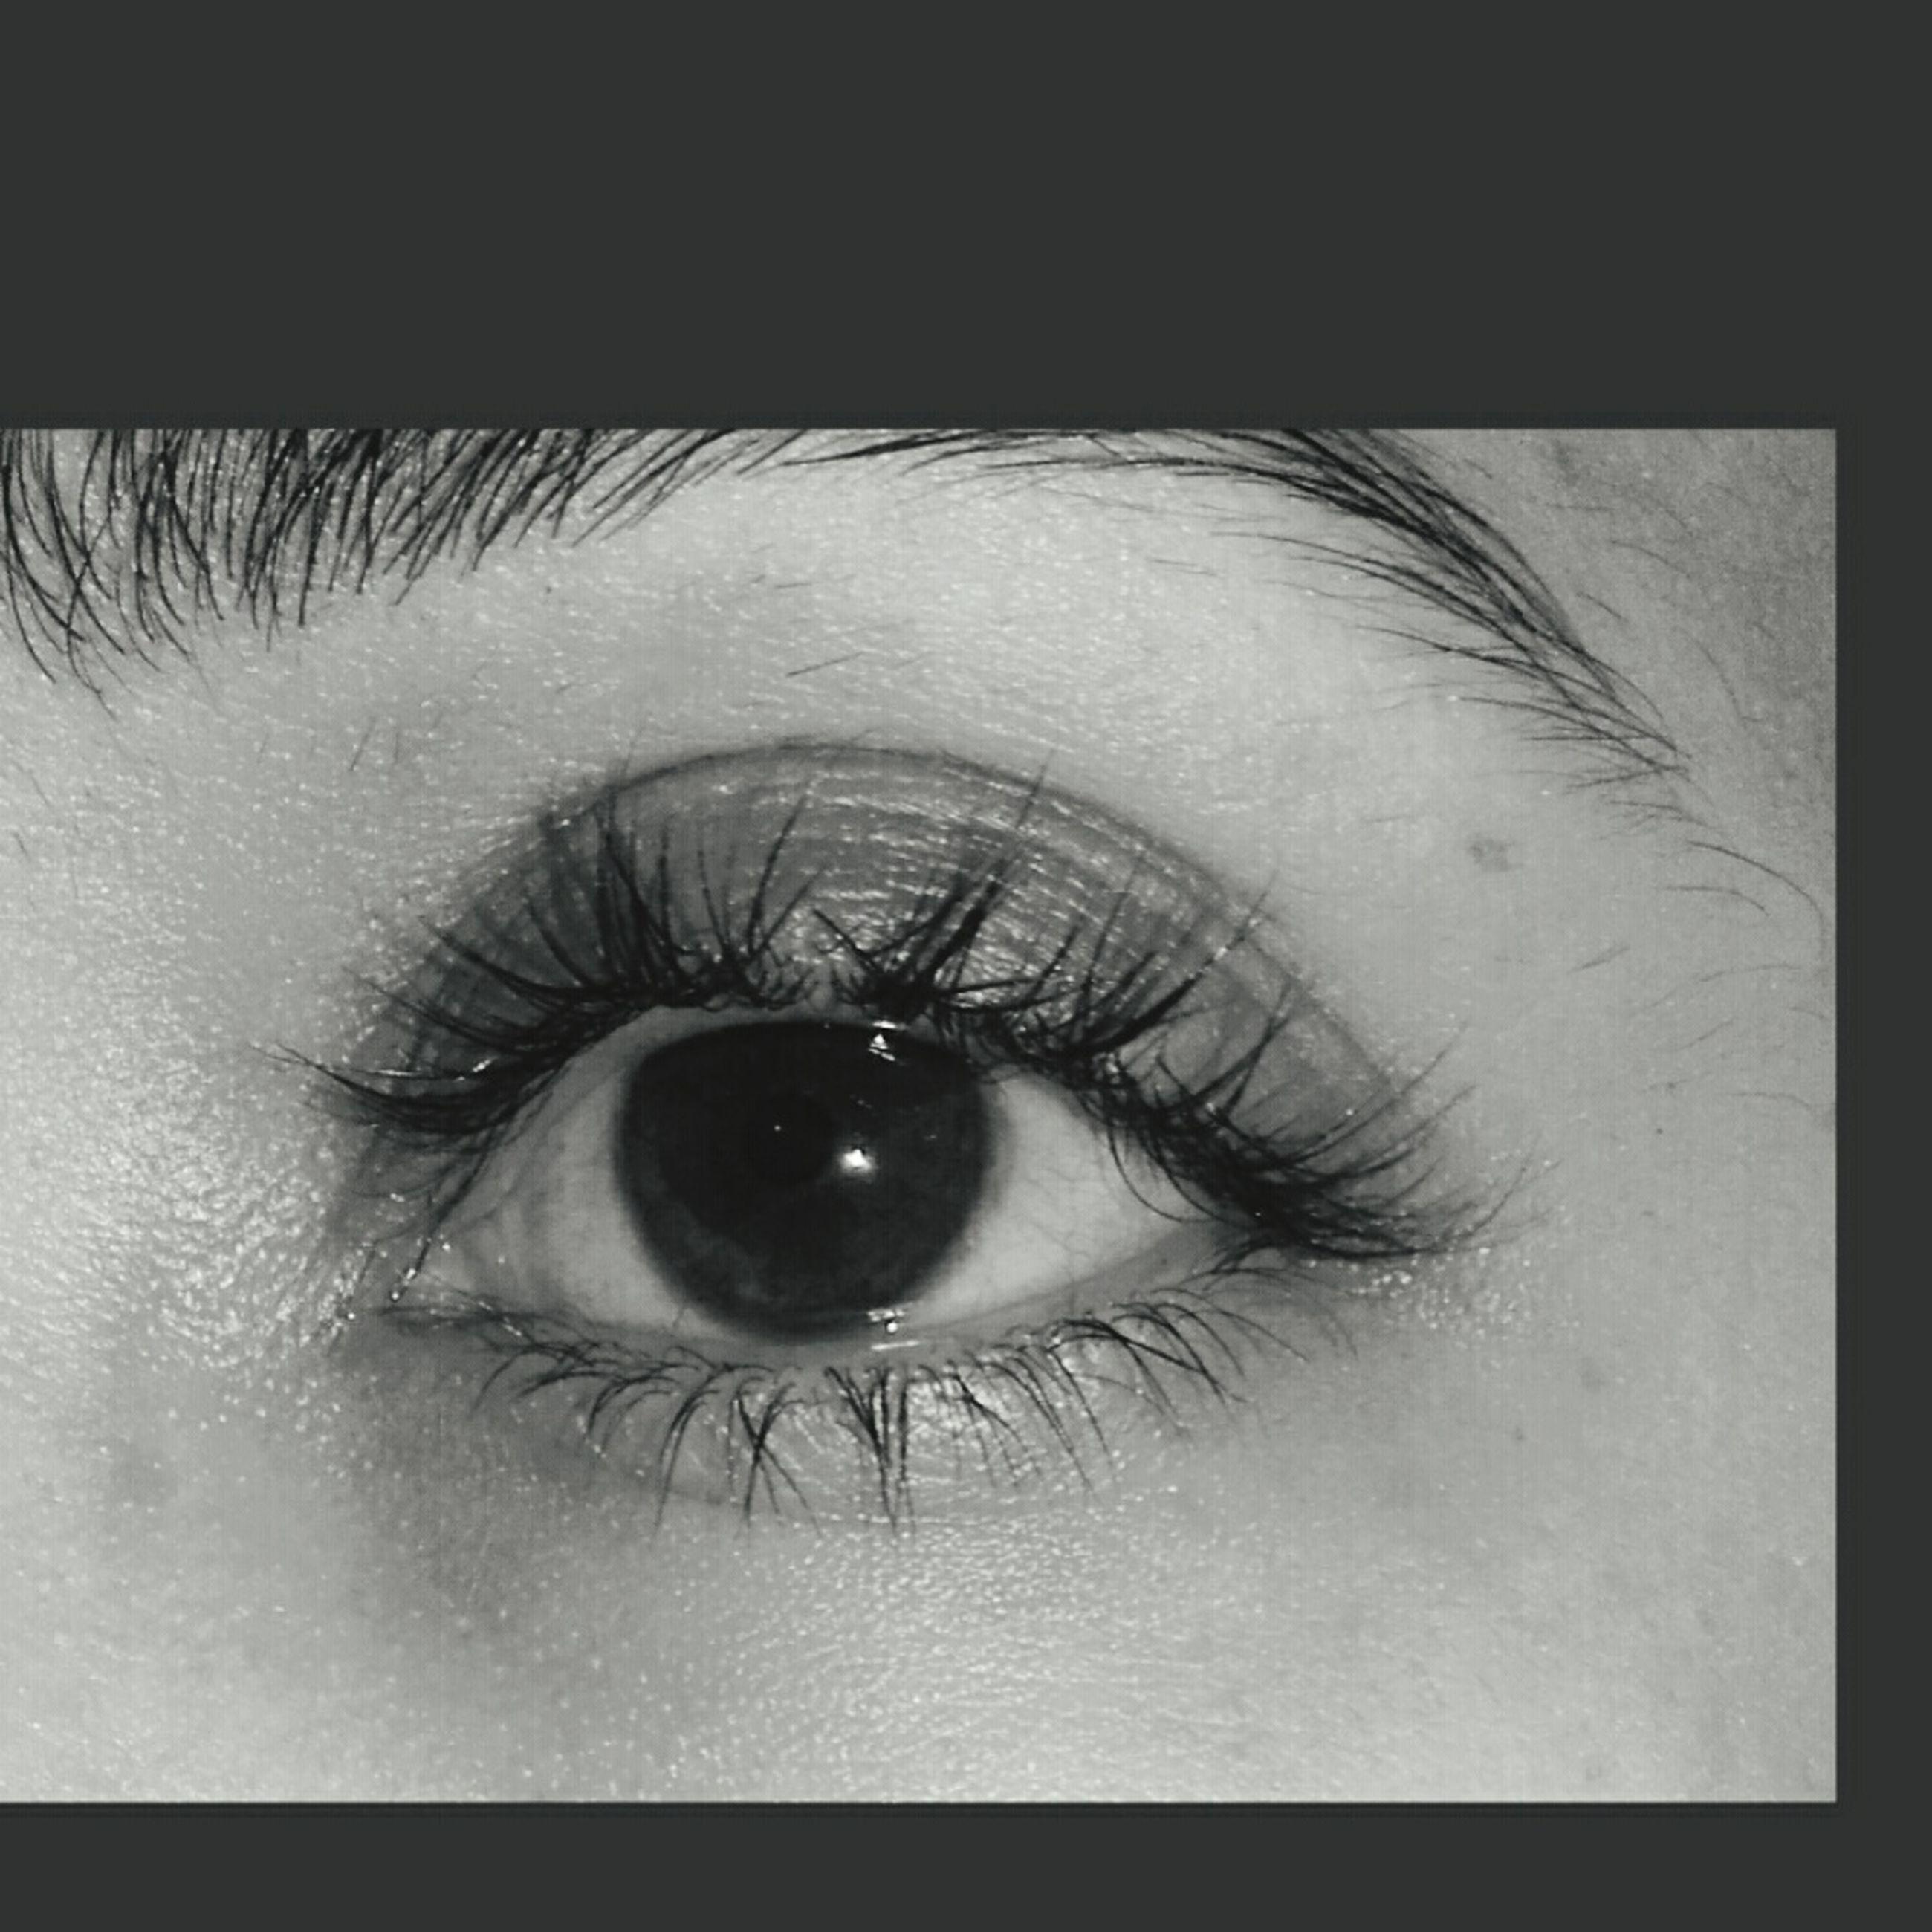 human eye, human body part, eyelash, close-up, sensory perception, macro, real people, eyesight, one person, eyeball, iris - eye, human skin, people, eyebrow, adult, outdoors, day